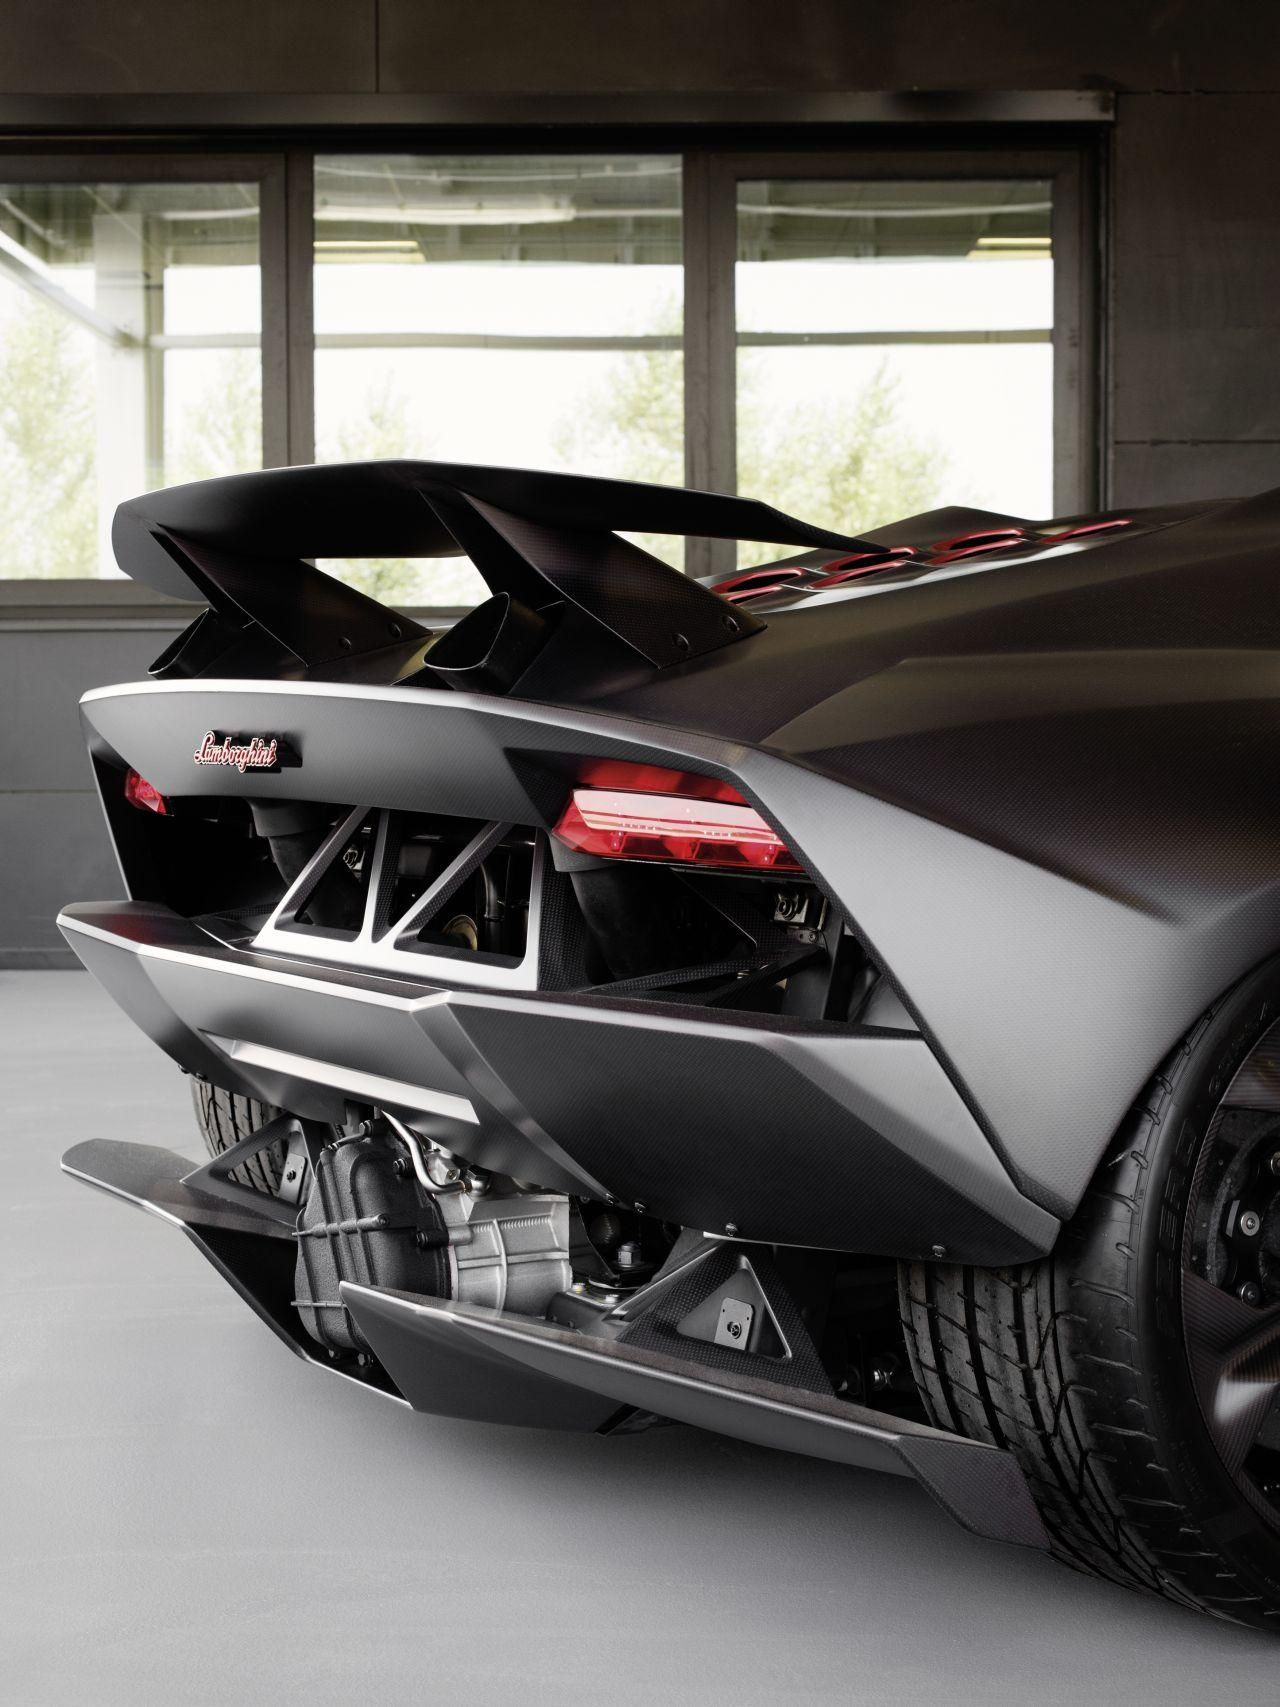 Lamborghini Sesto Elemento Vazam Detalhes E Imagens Da Versao De